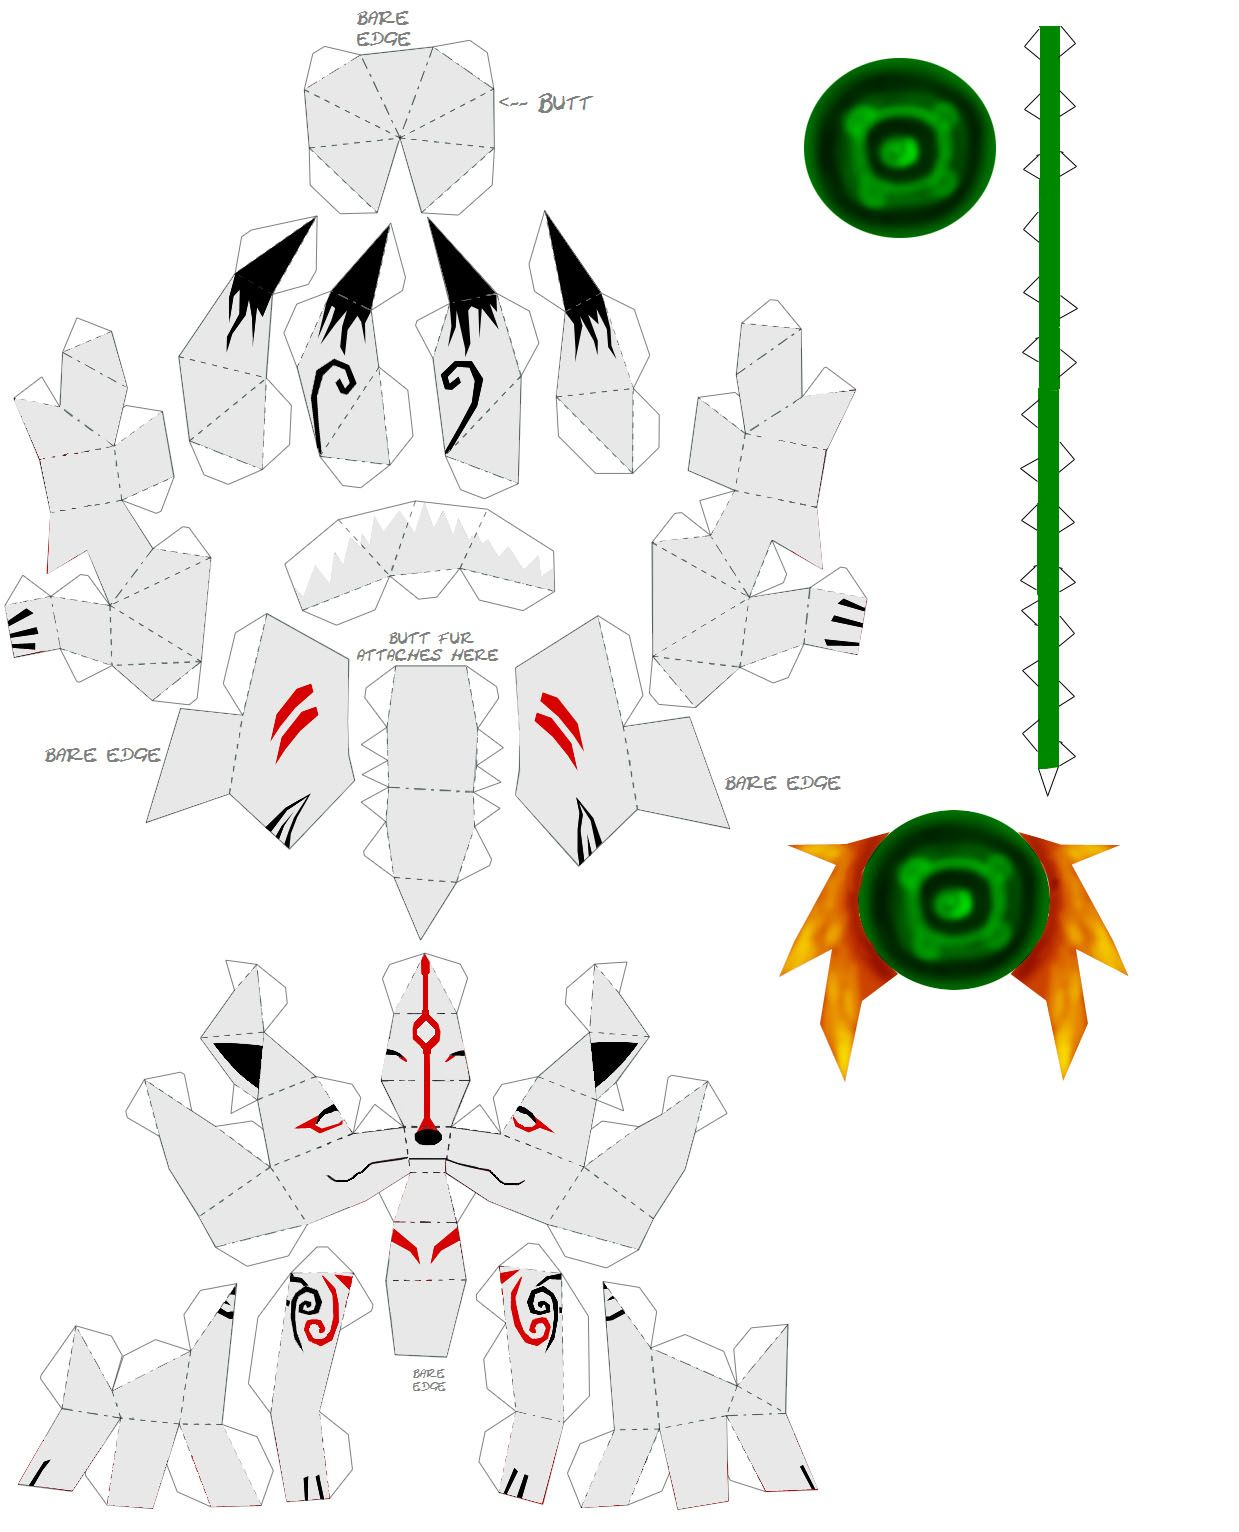 pokemon papercraft templates stickmens1234 mar 8 2011